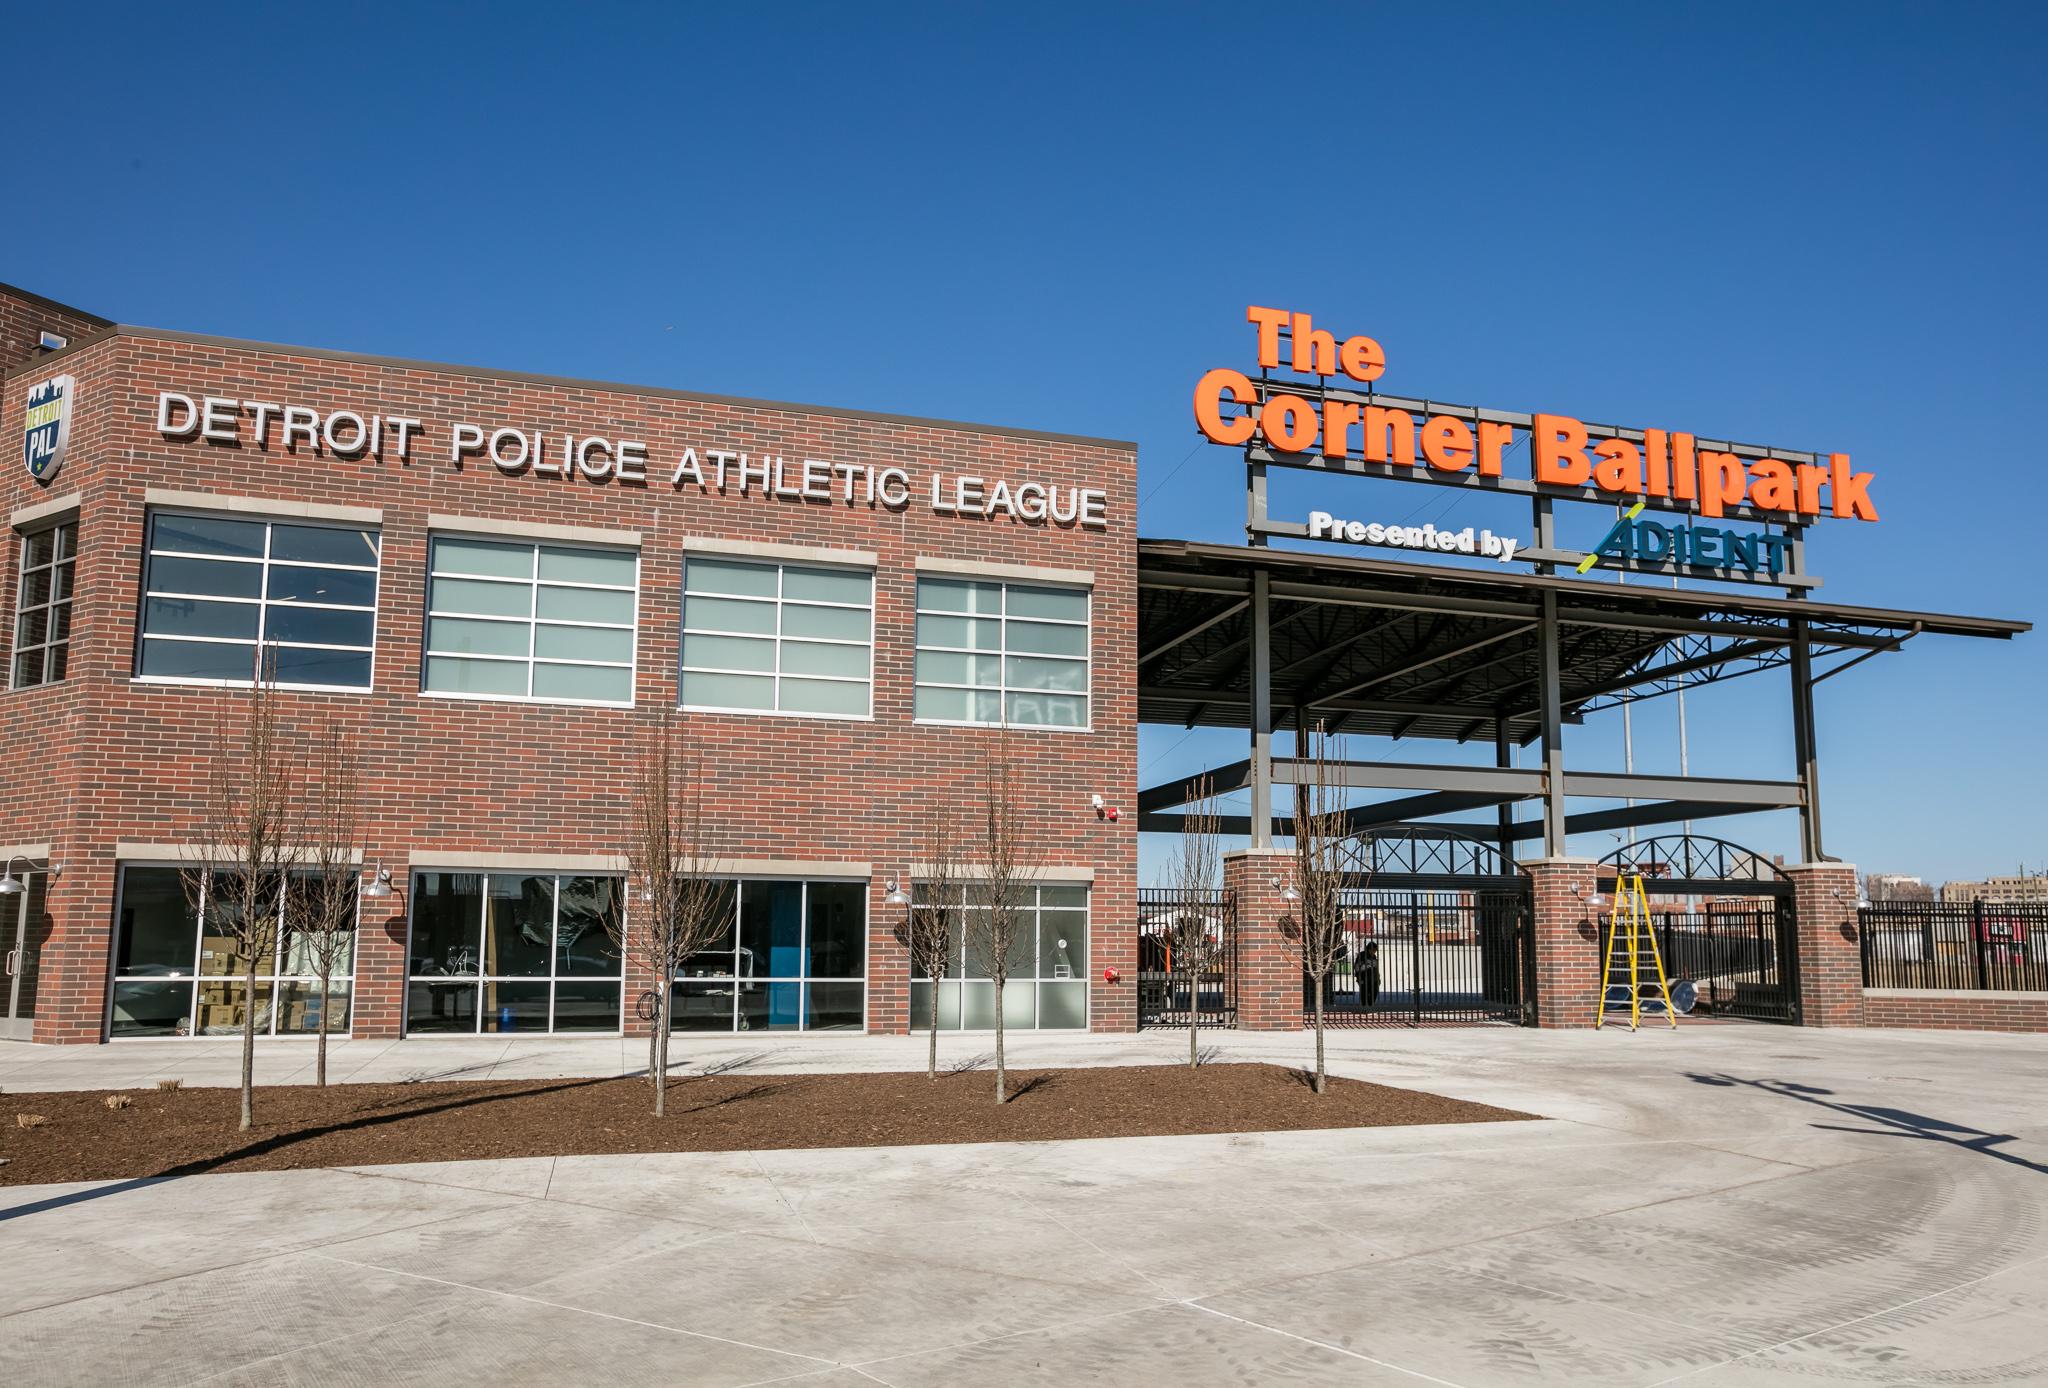 Sneak Peek Inside The Corner Ballpark At The Old Tiger